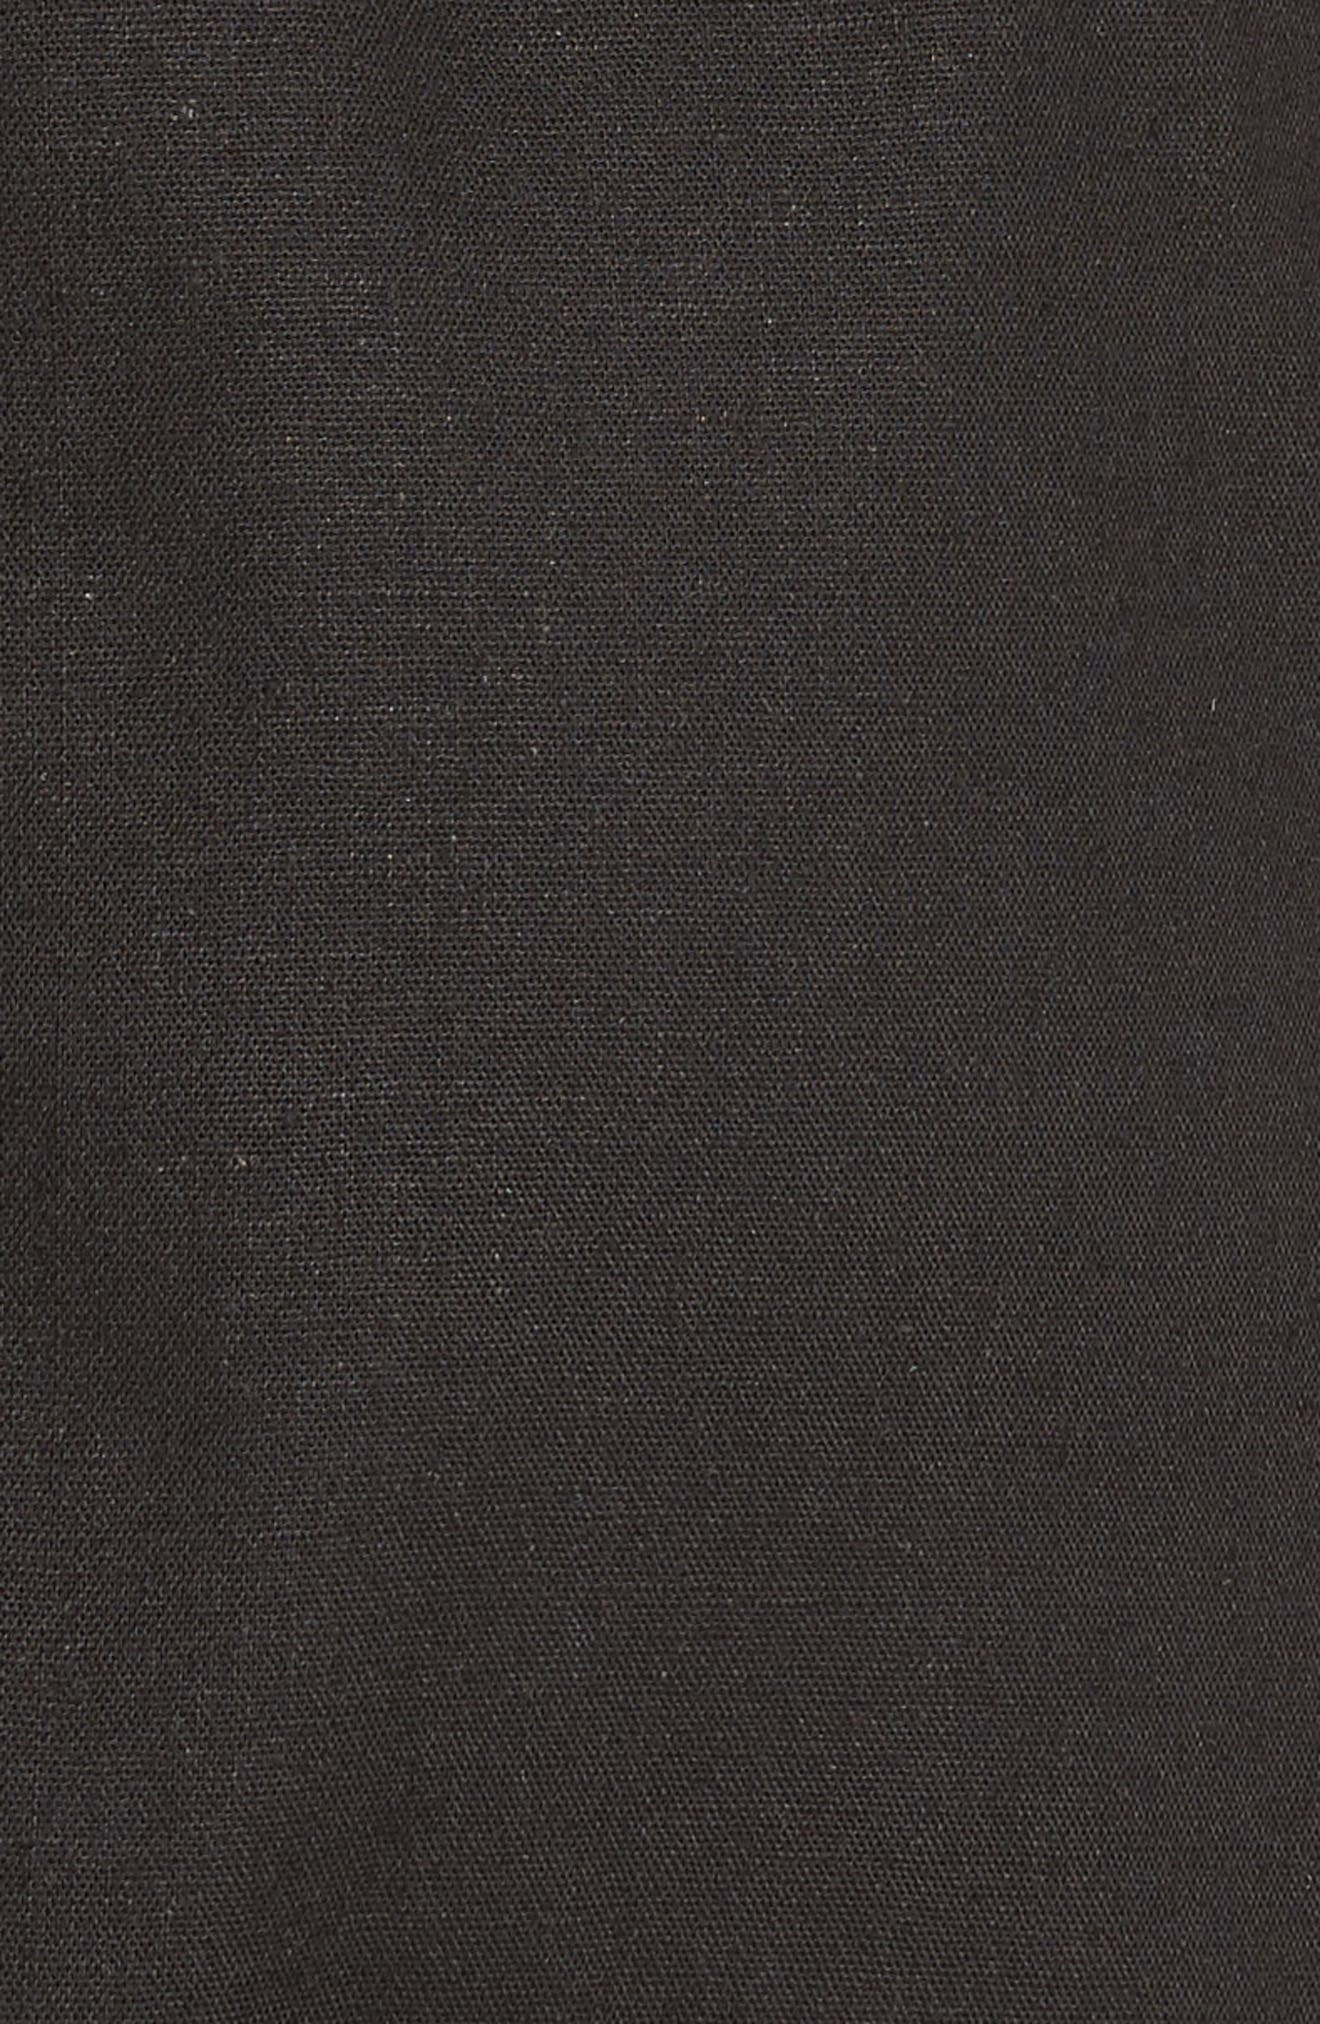 Ruffle Wrap Dress,                             Alternate thumbnail 21, color,